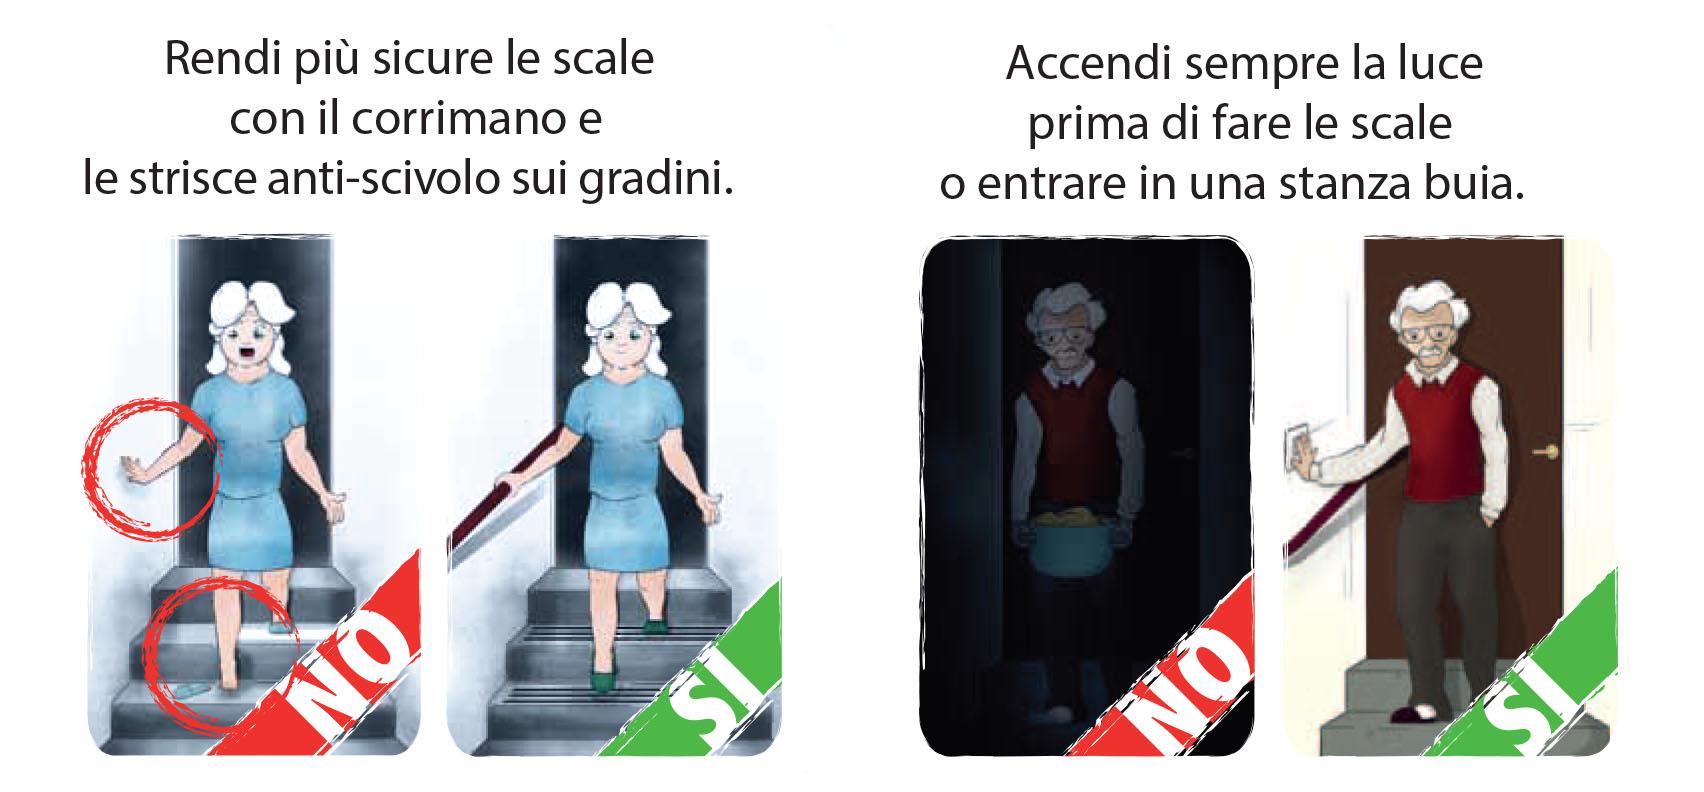 anziani-pighevole-scale2